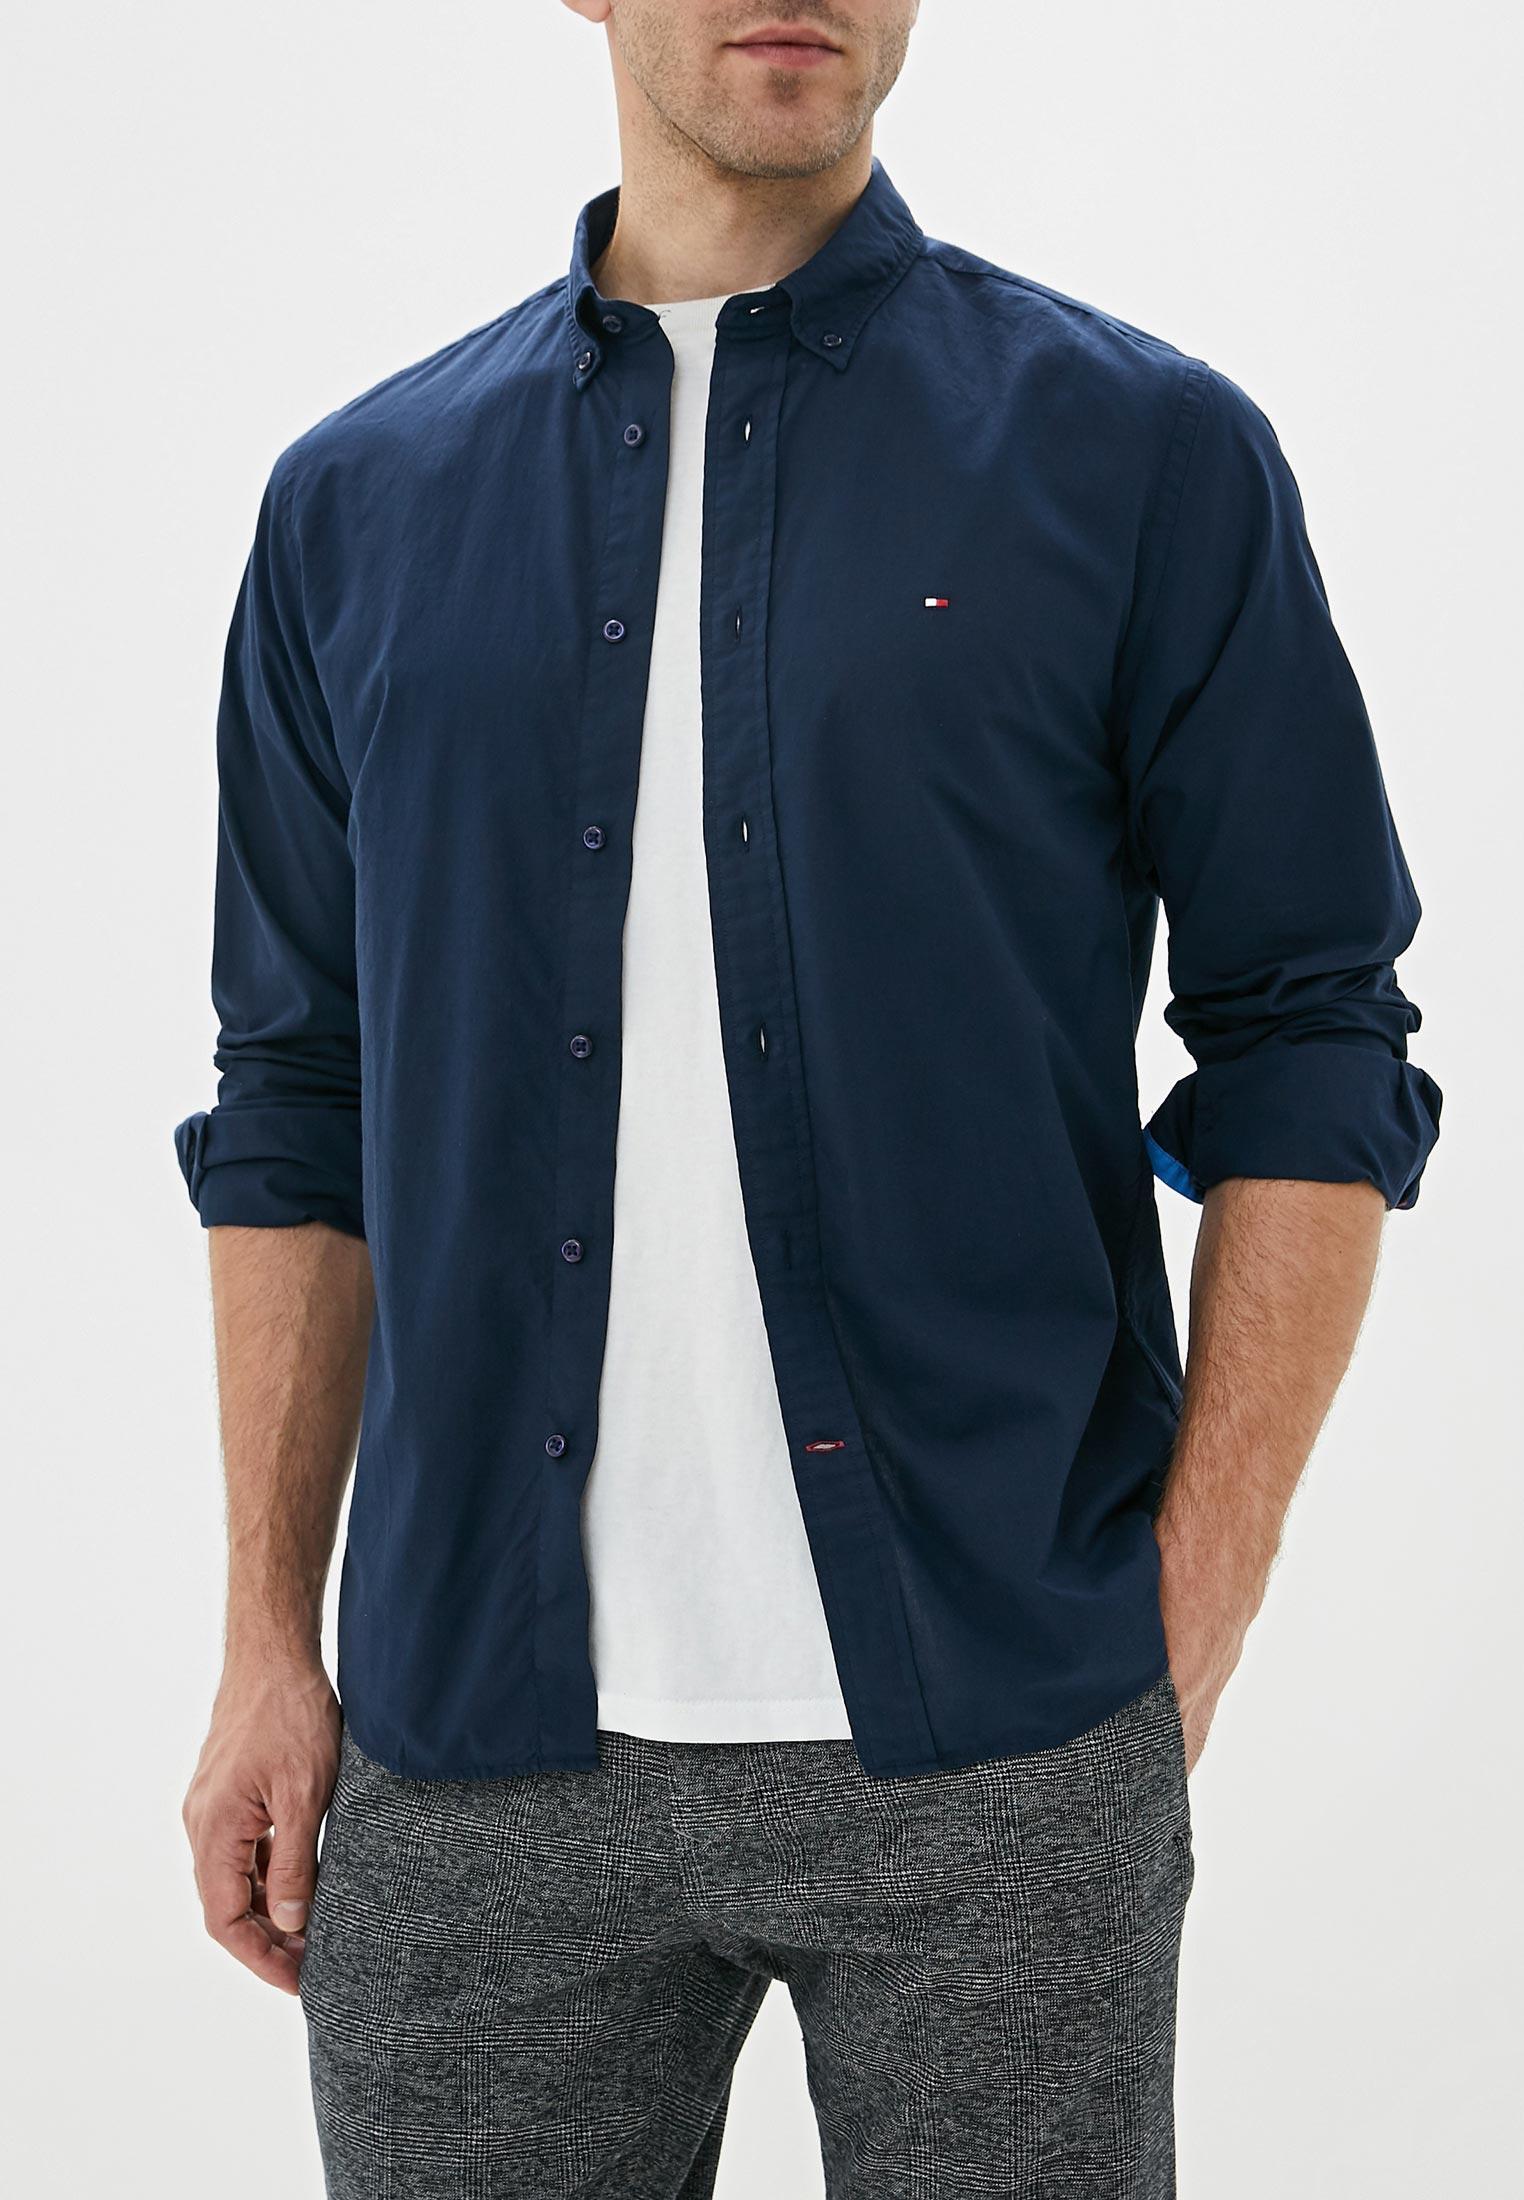 Рубашка с длинным рукавом Tommy Hilfiger (Томми Хилфигер) MW0MW11907